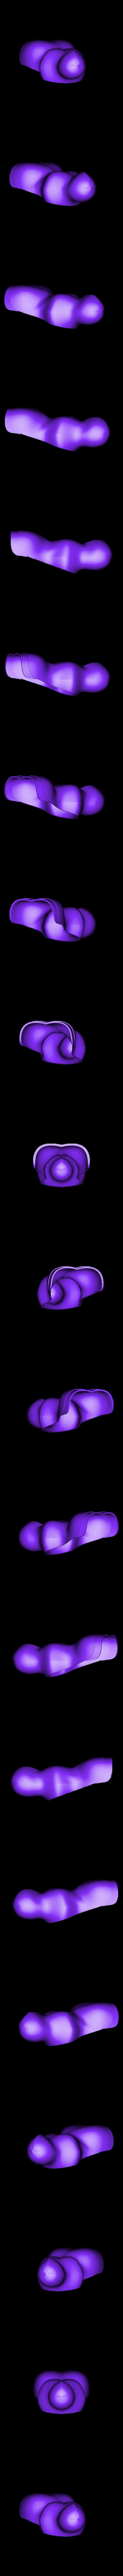 matriochka v3 a N3.stl Télécharger fichier STL gratuit WHITE MATRIOCHKA • Design pour impression 3D, DJER